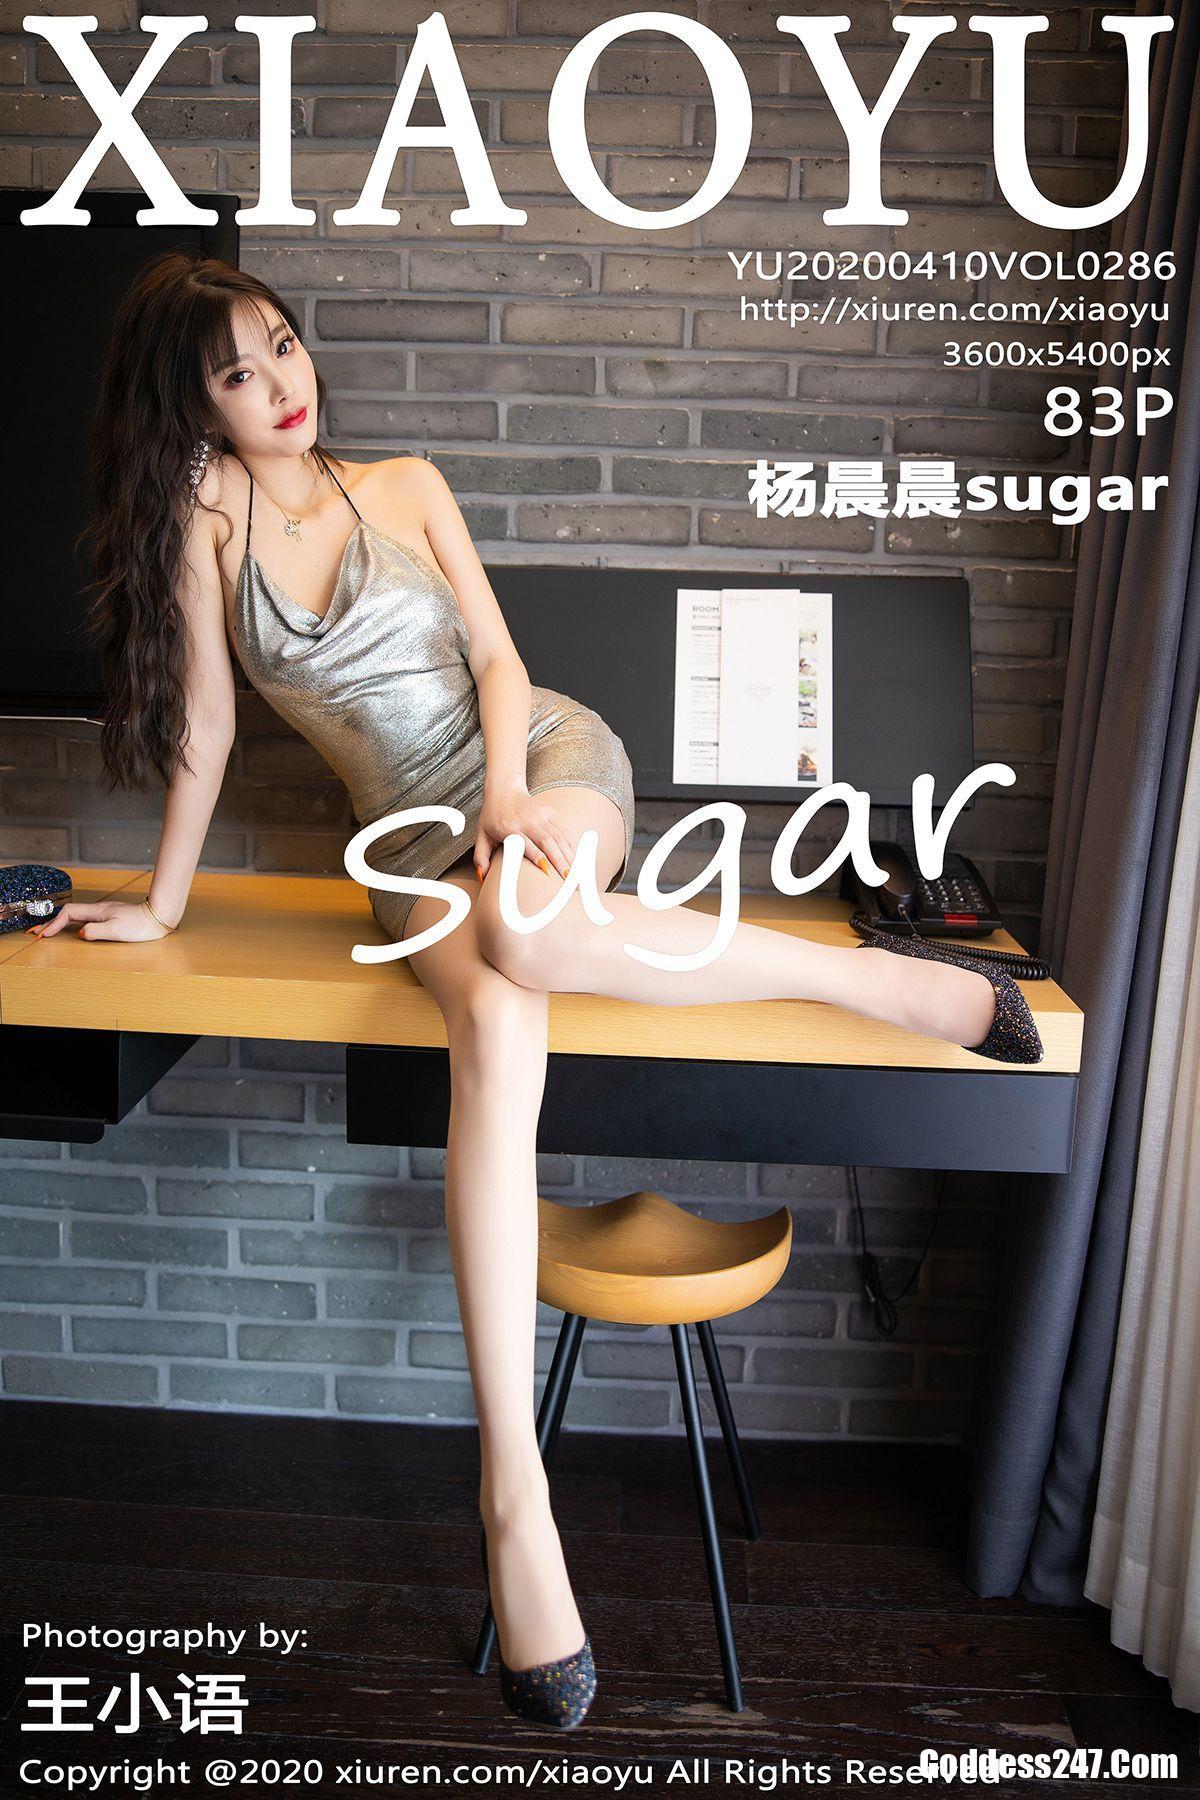 XiaoYu Vol.286 杨晨晨sugar